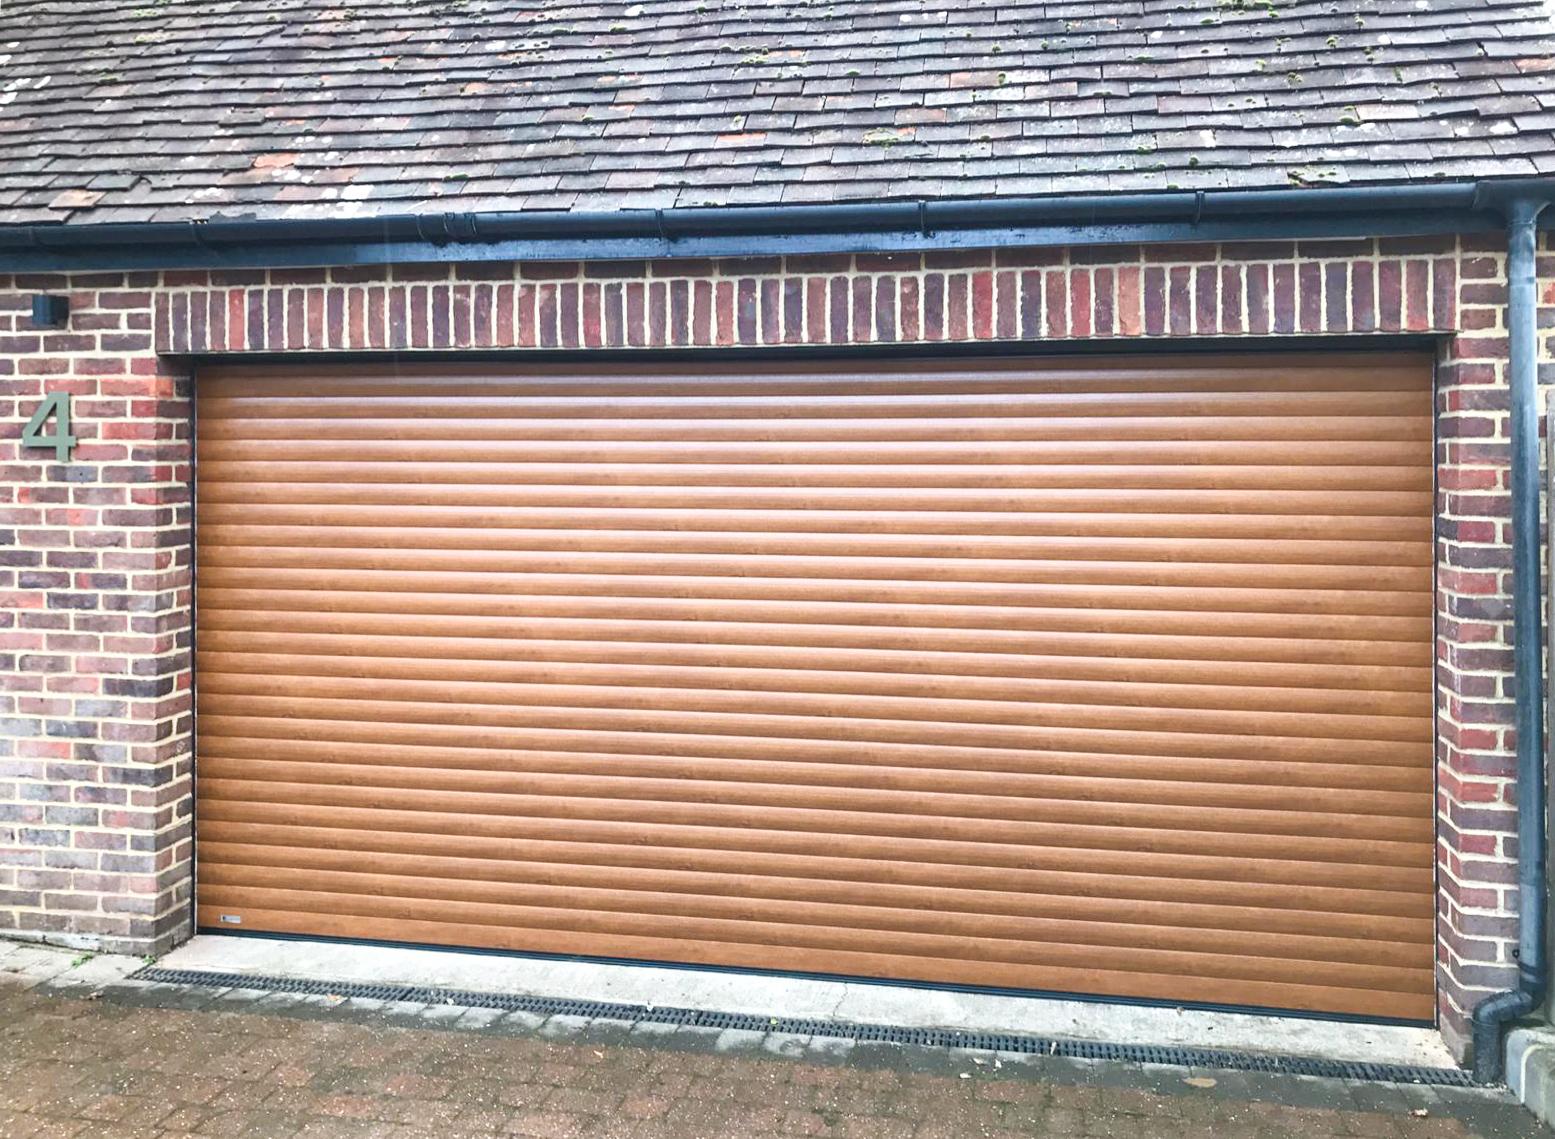 SWS SeceuroGlide Double Roller Garage Door Finished in Golden Oak